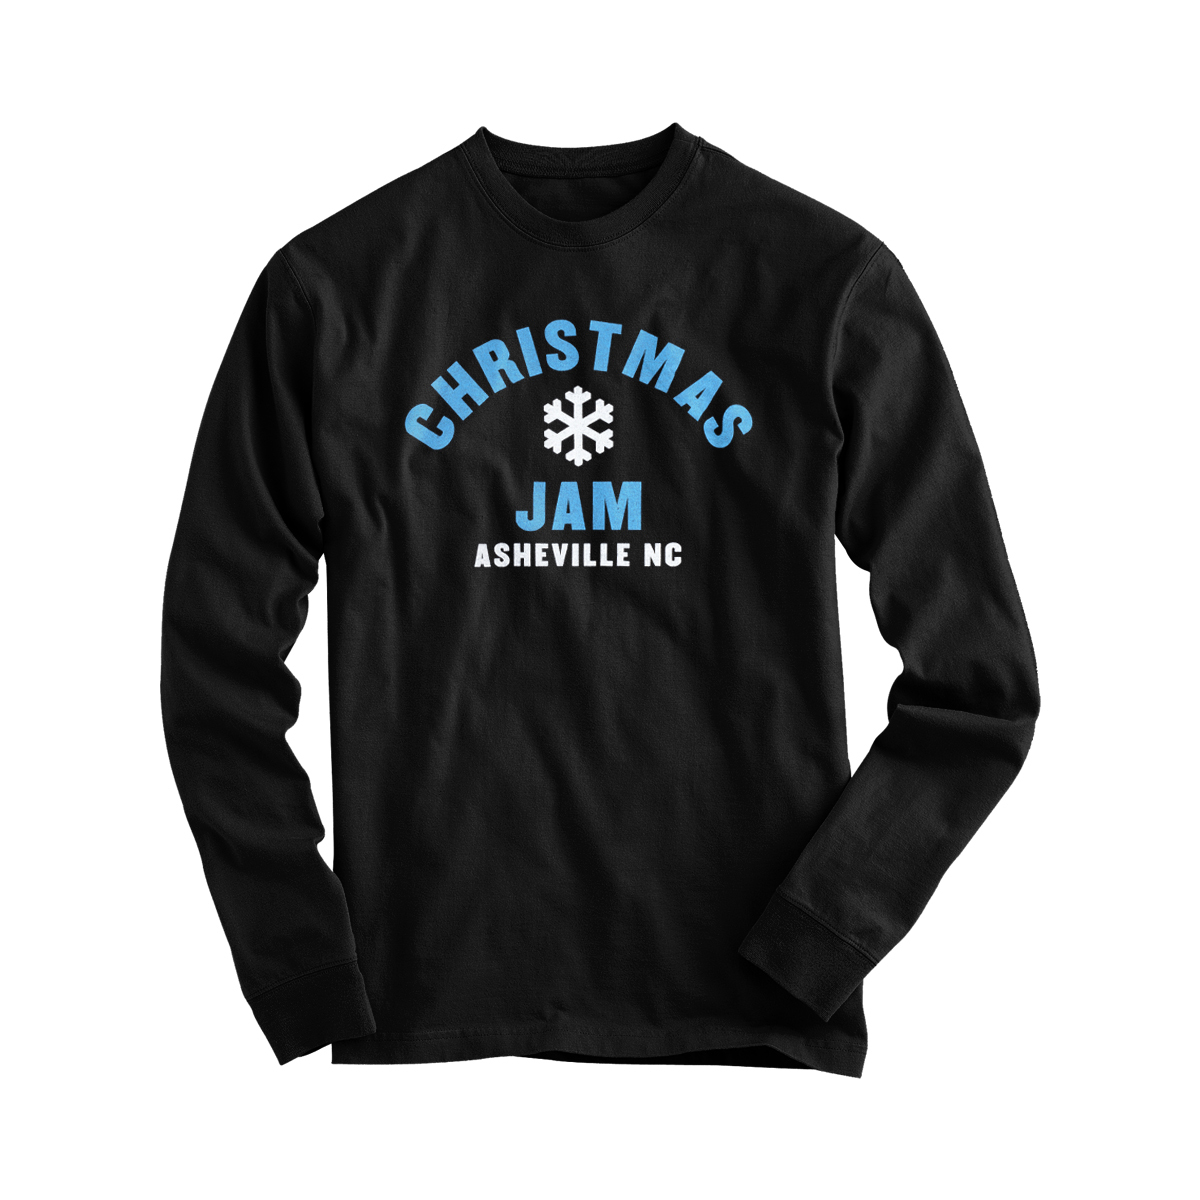 2018 Christmas Jam Long-Sleeve T-Shirt